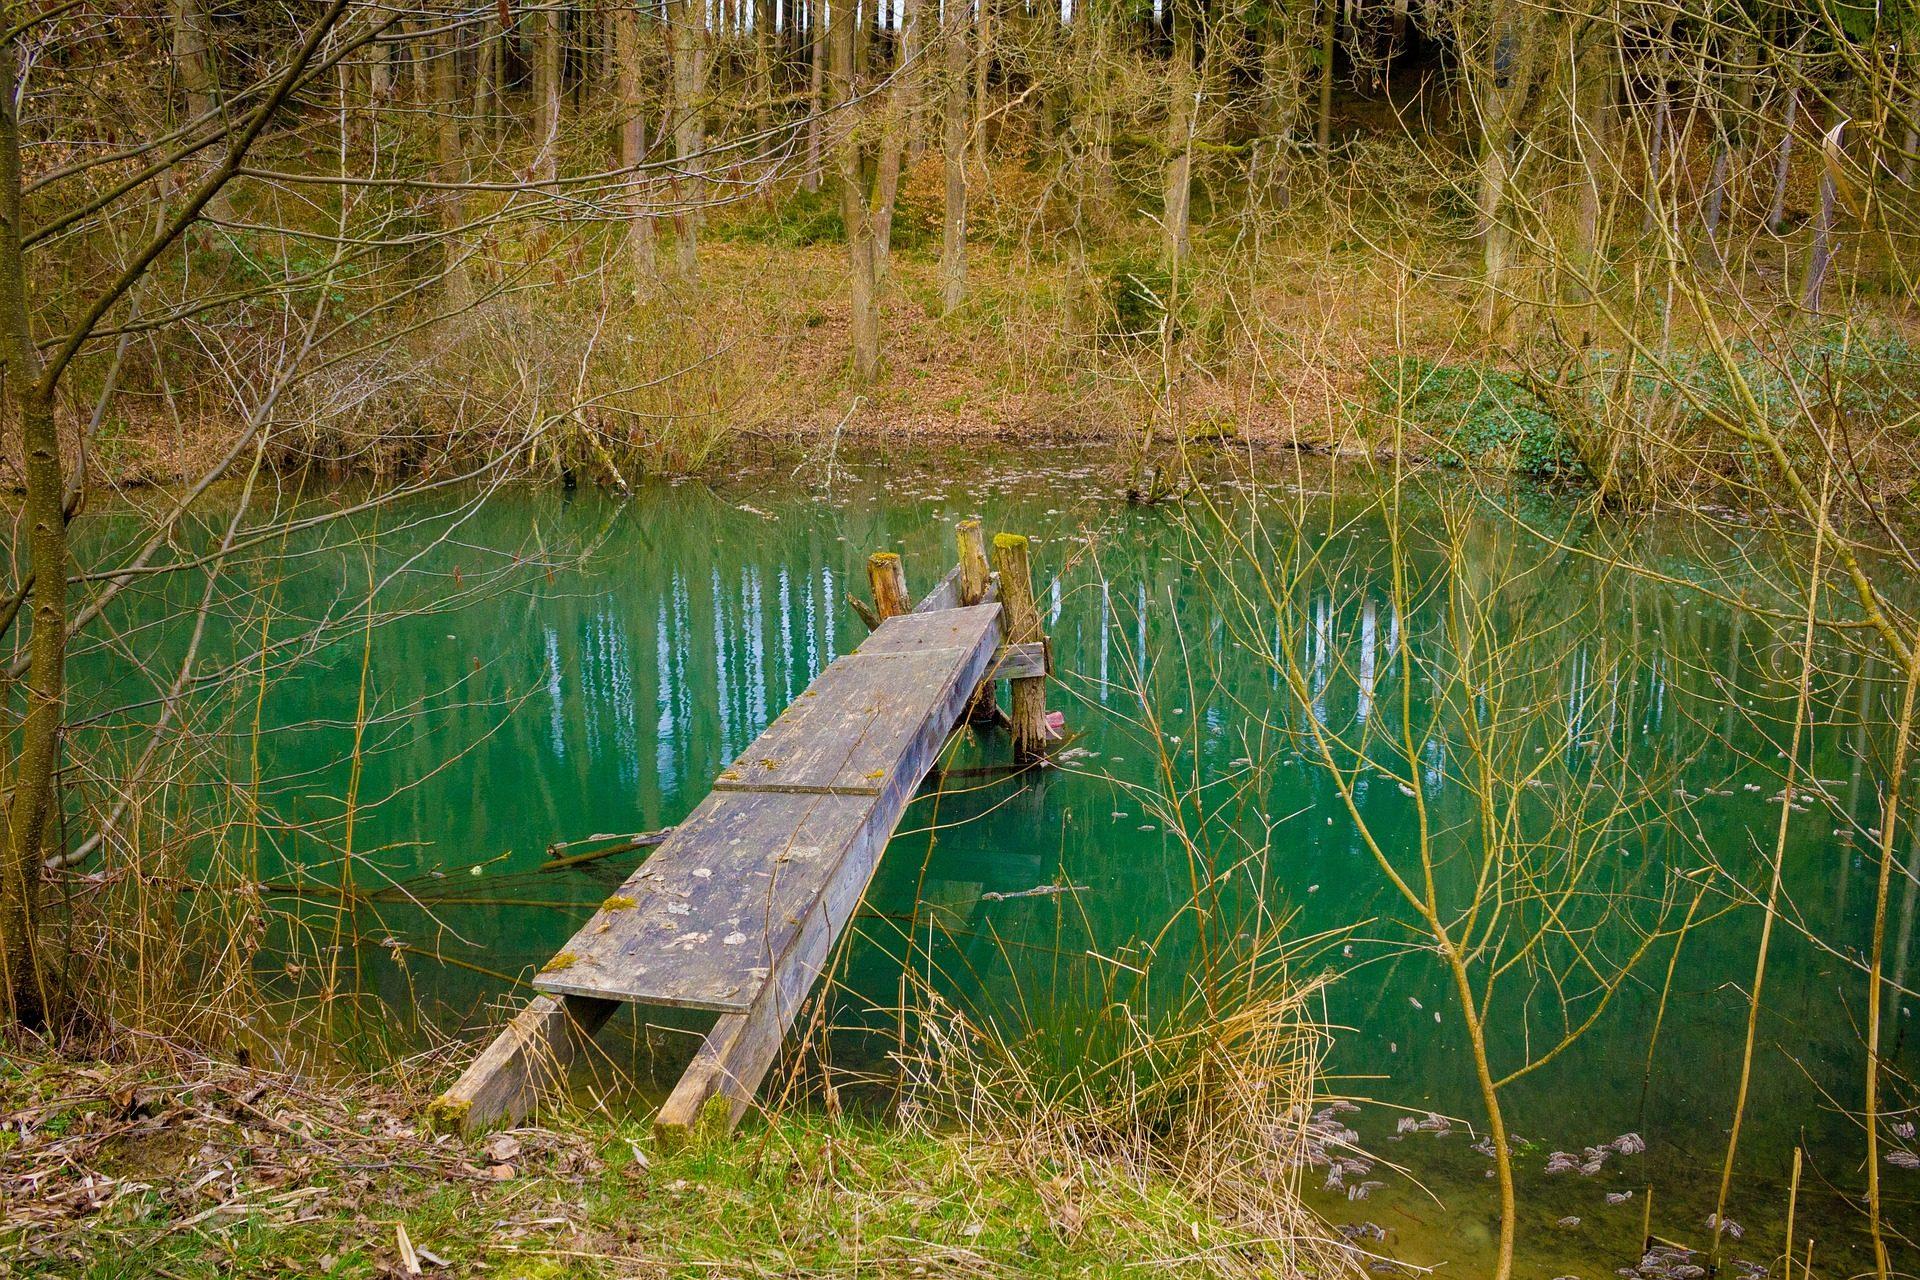 lago, charca, maderas, rotas, sucio, abandonado - Fondos de Pantalla HD - professor-falken.com